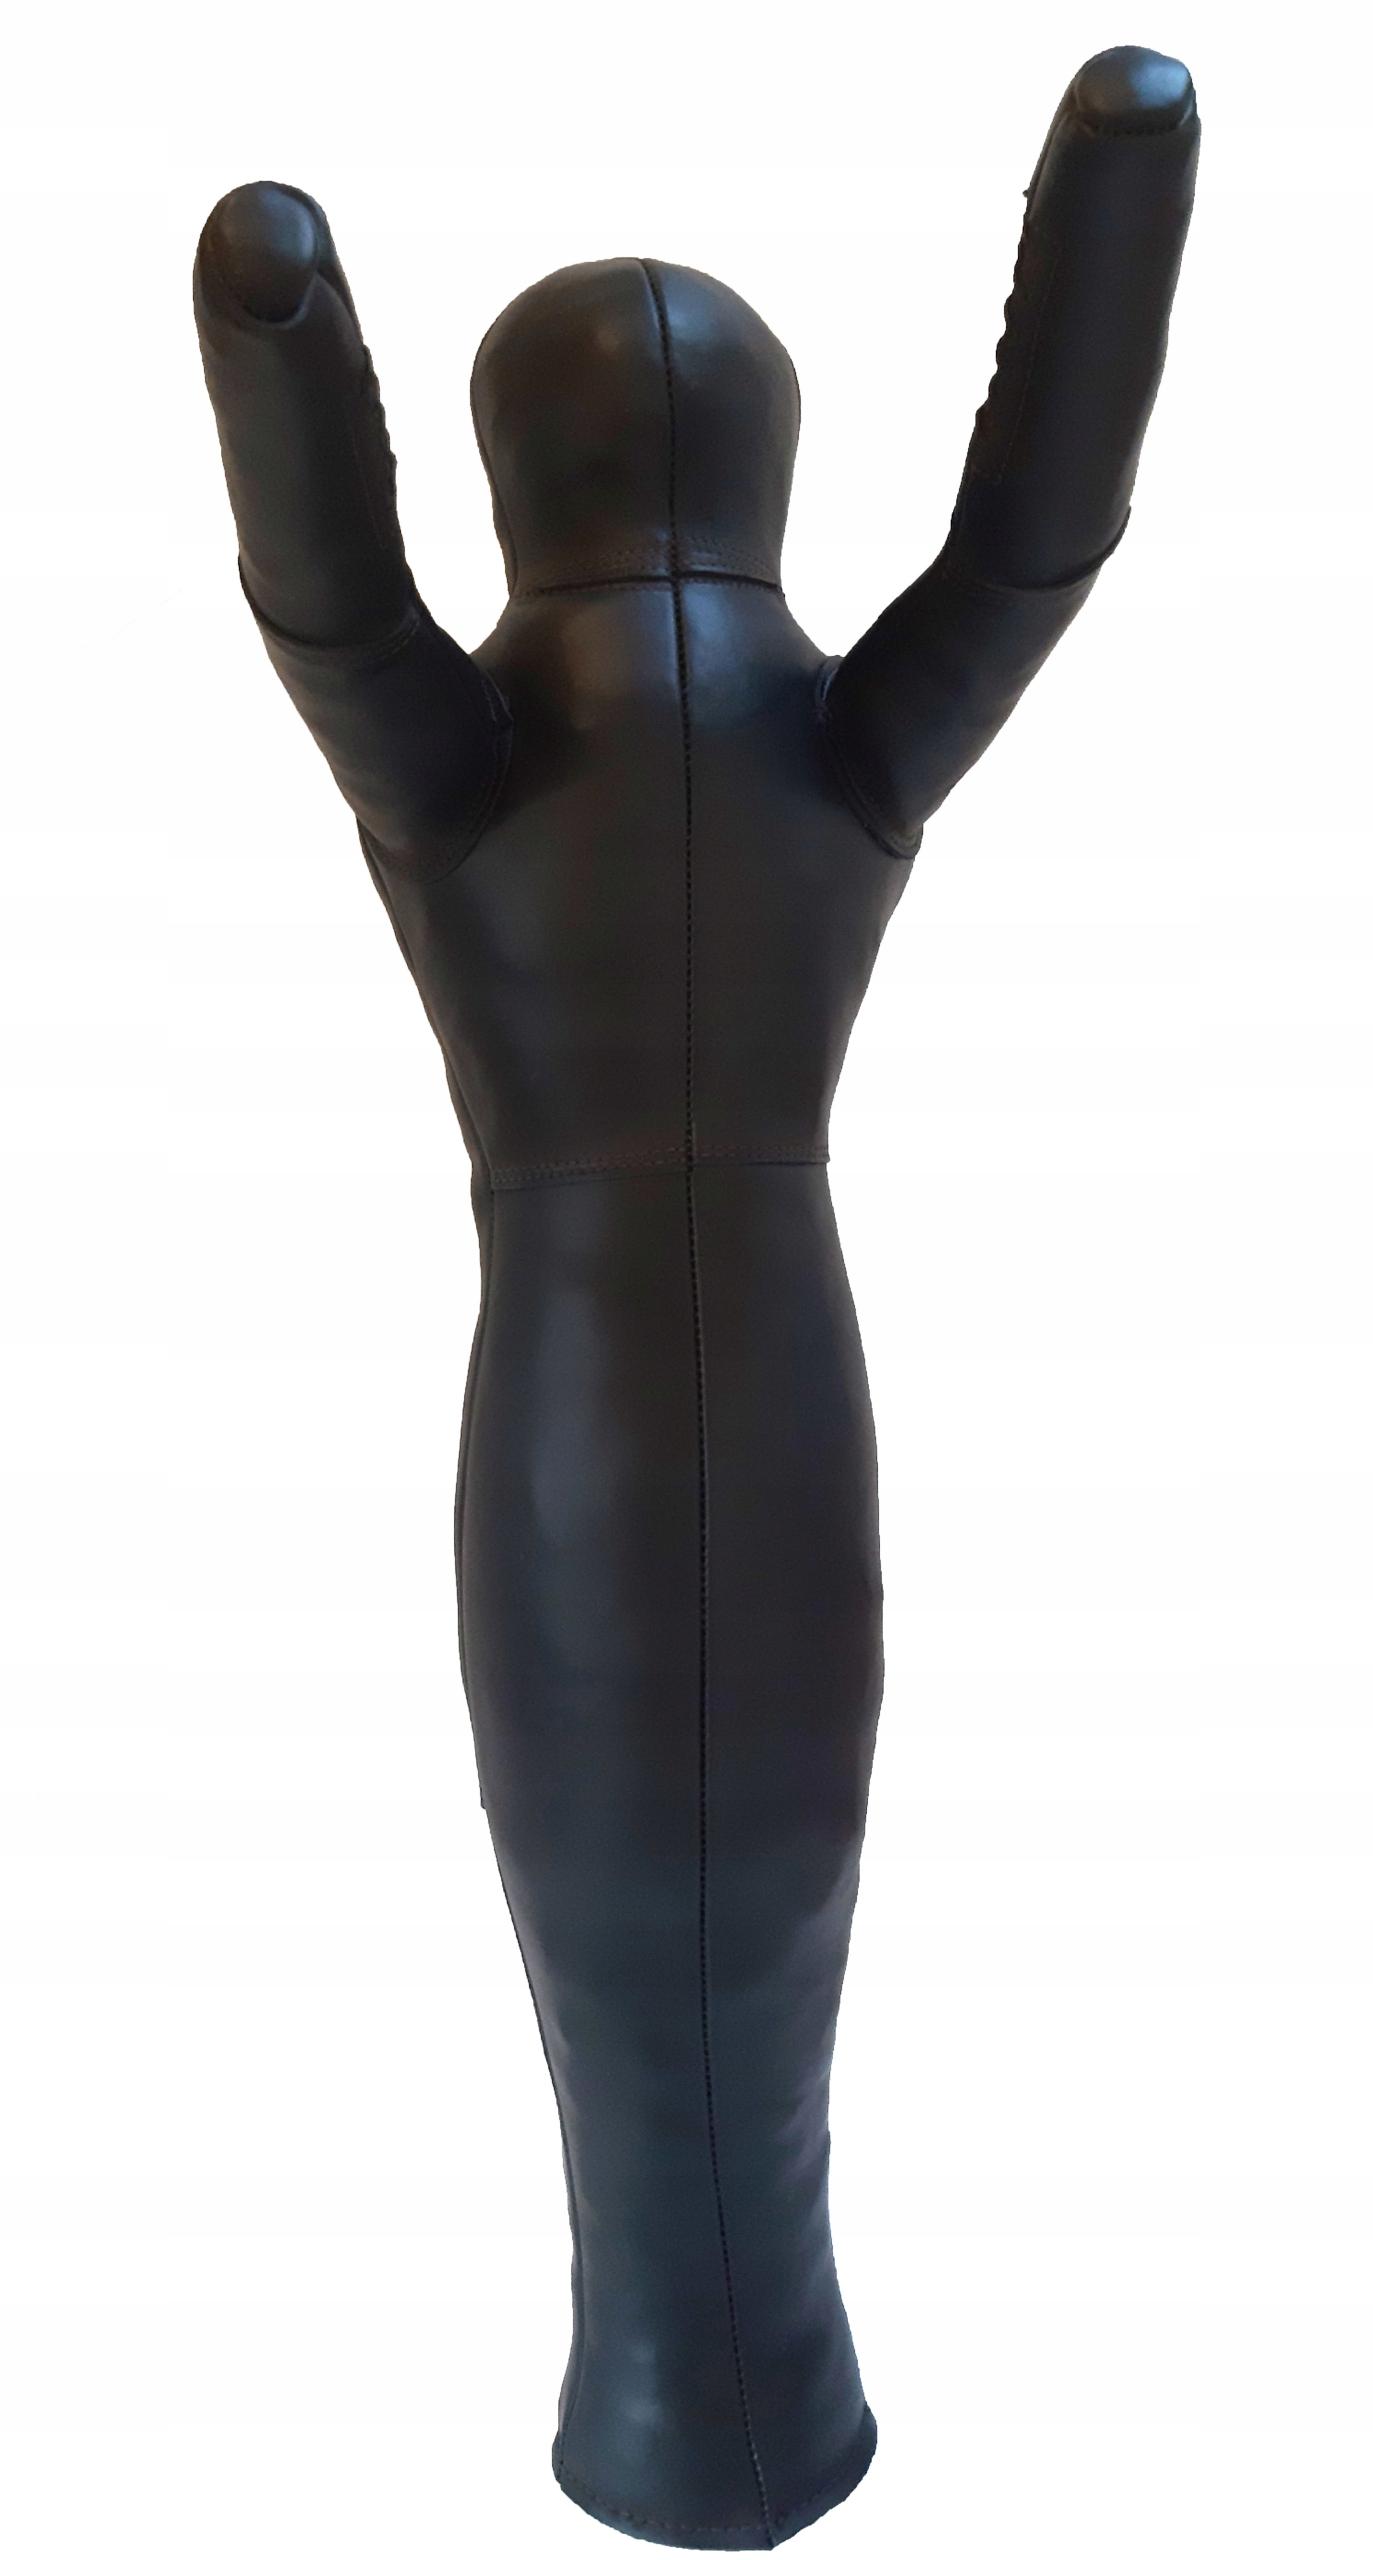 Manekin Wr. 140cm / 21 kg. Single Koža